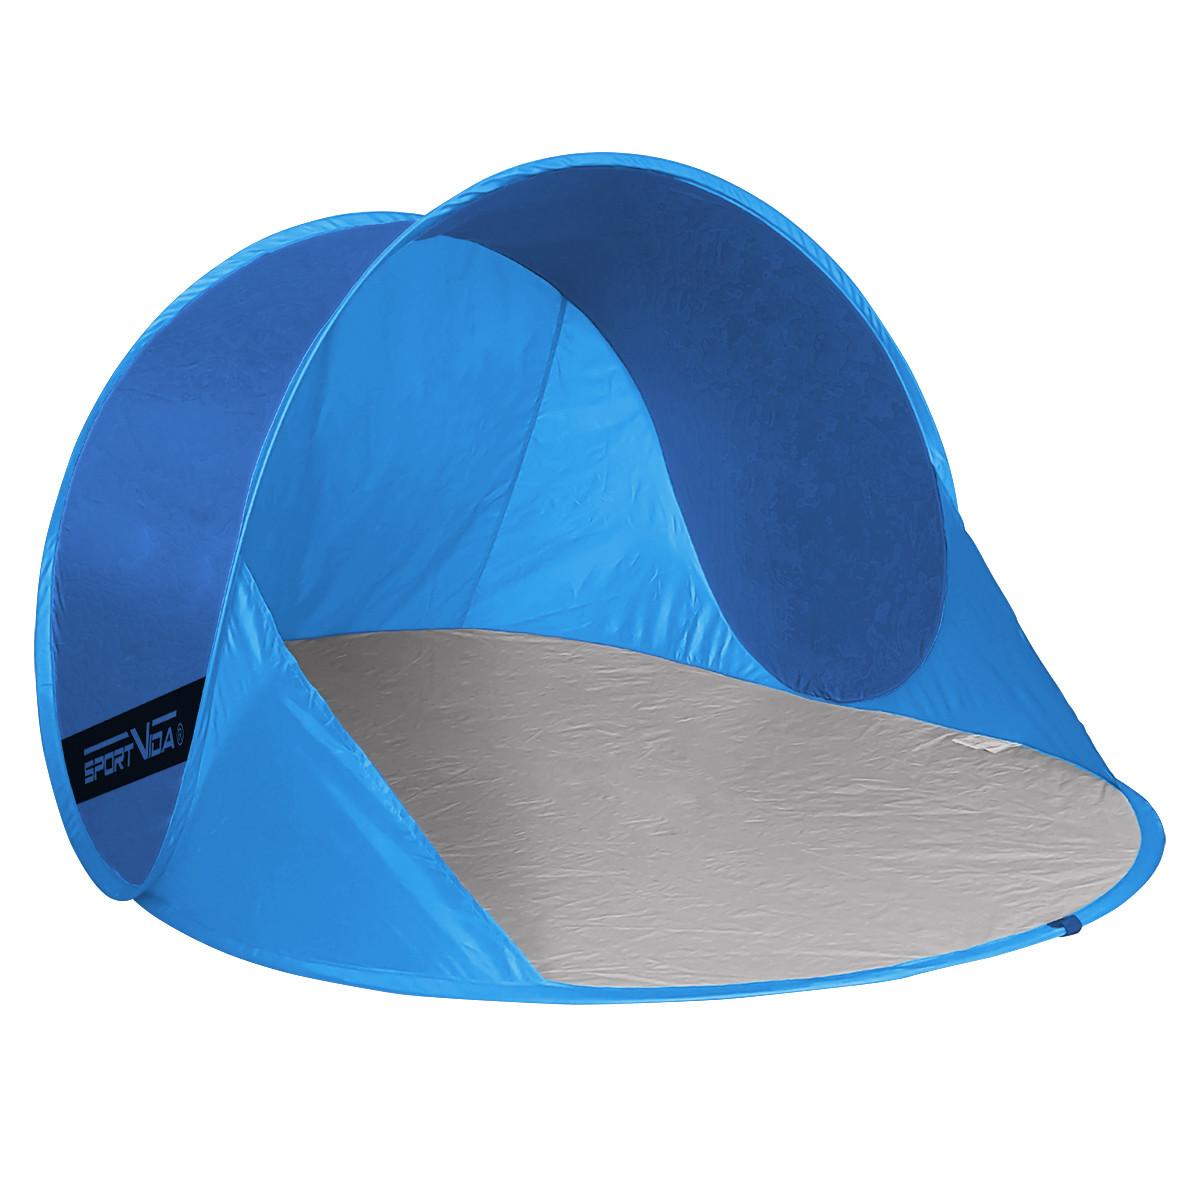 Пляжный тент SportVida 190x120 см SV-WS0006 Blue/Sky Blue